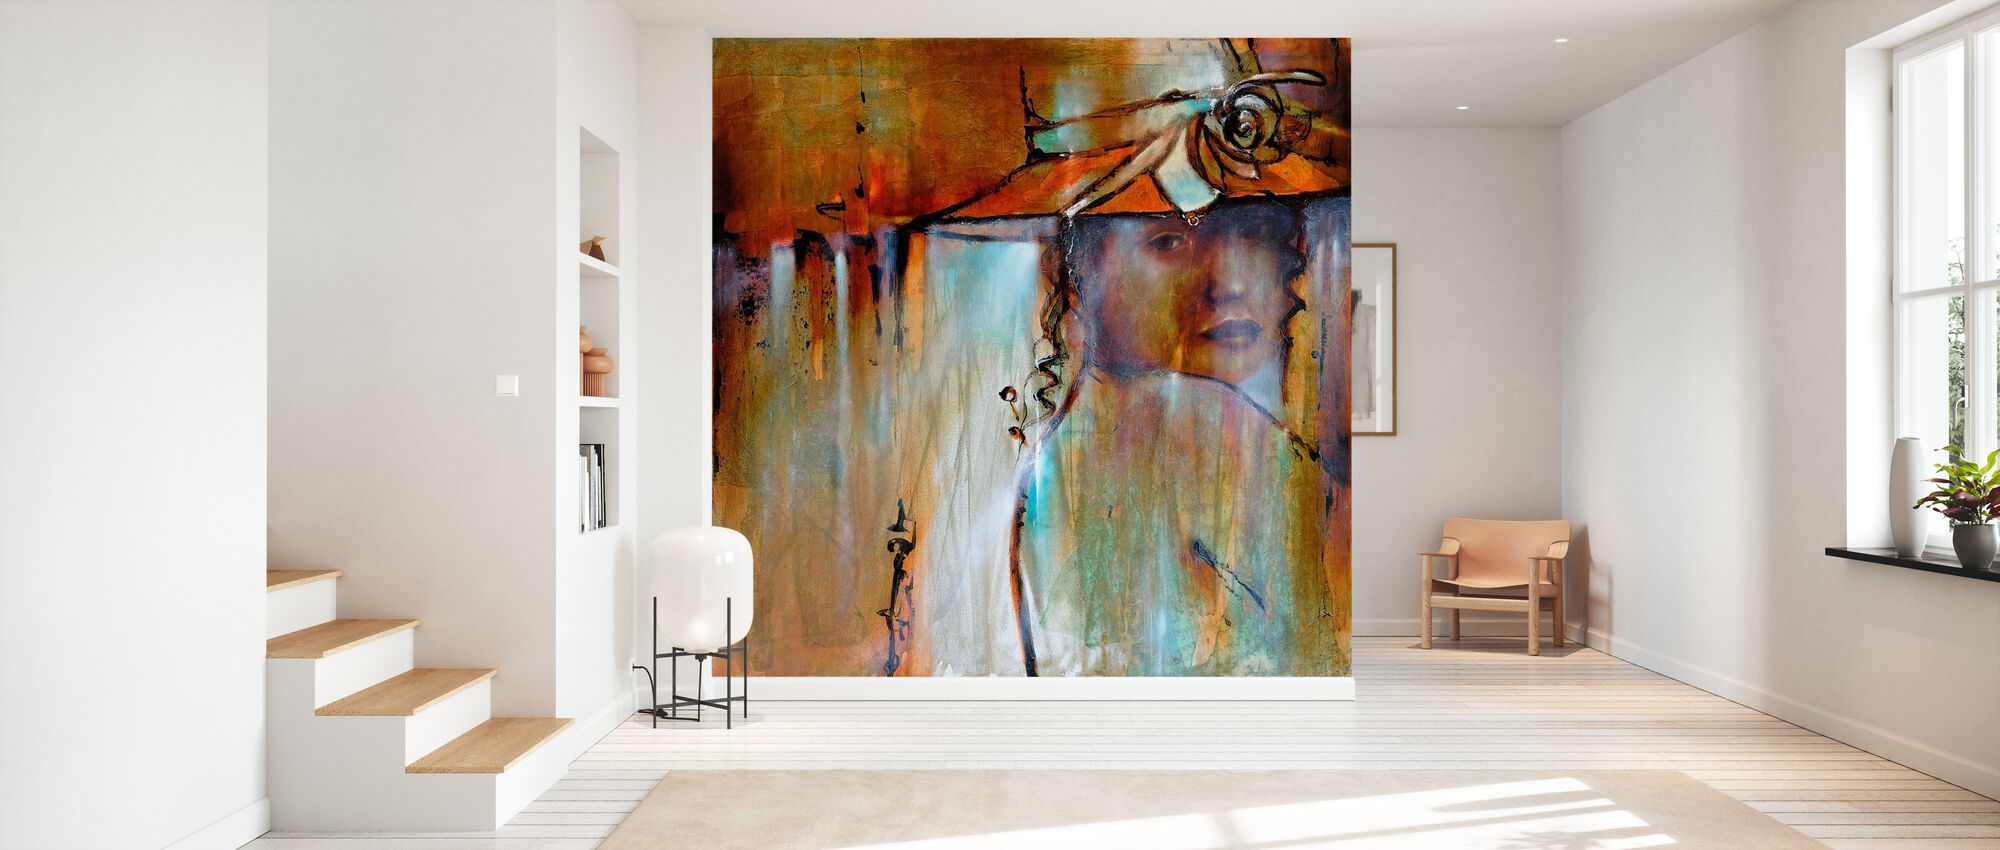 Elena with Hut - Wallpaper - Hallway